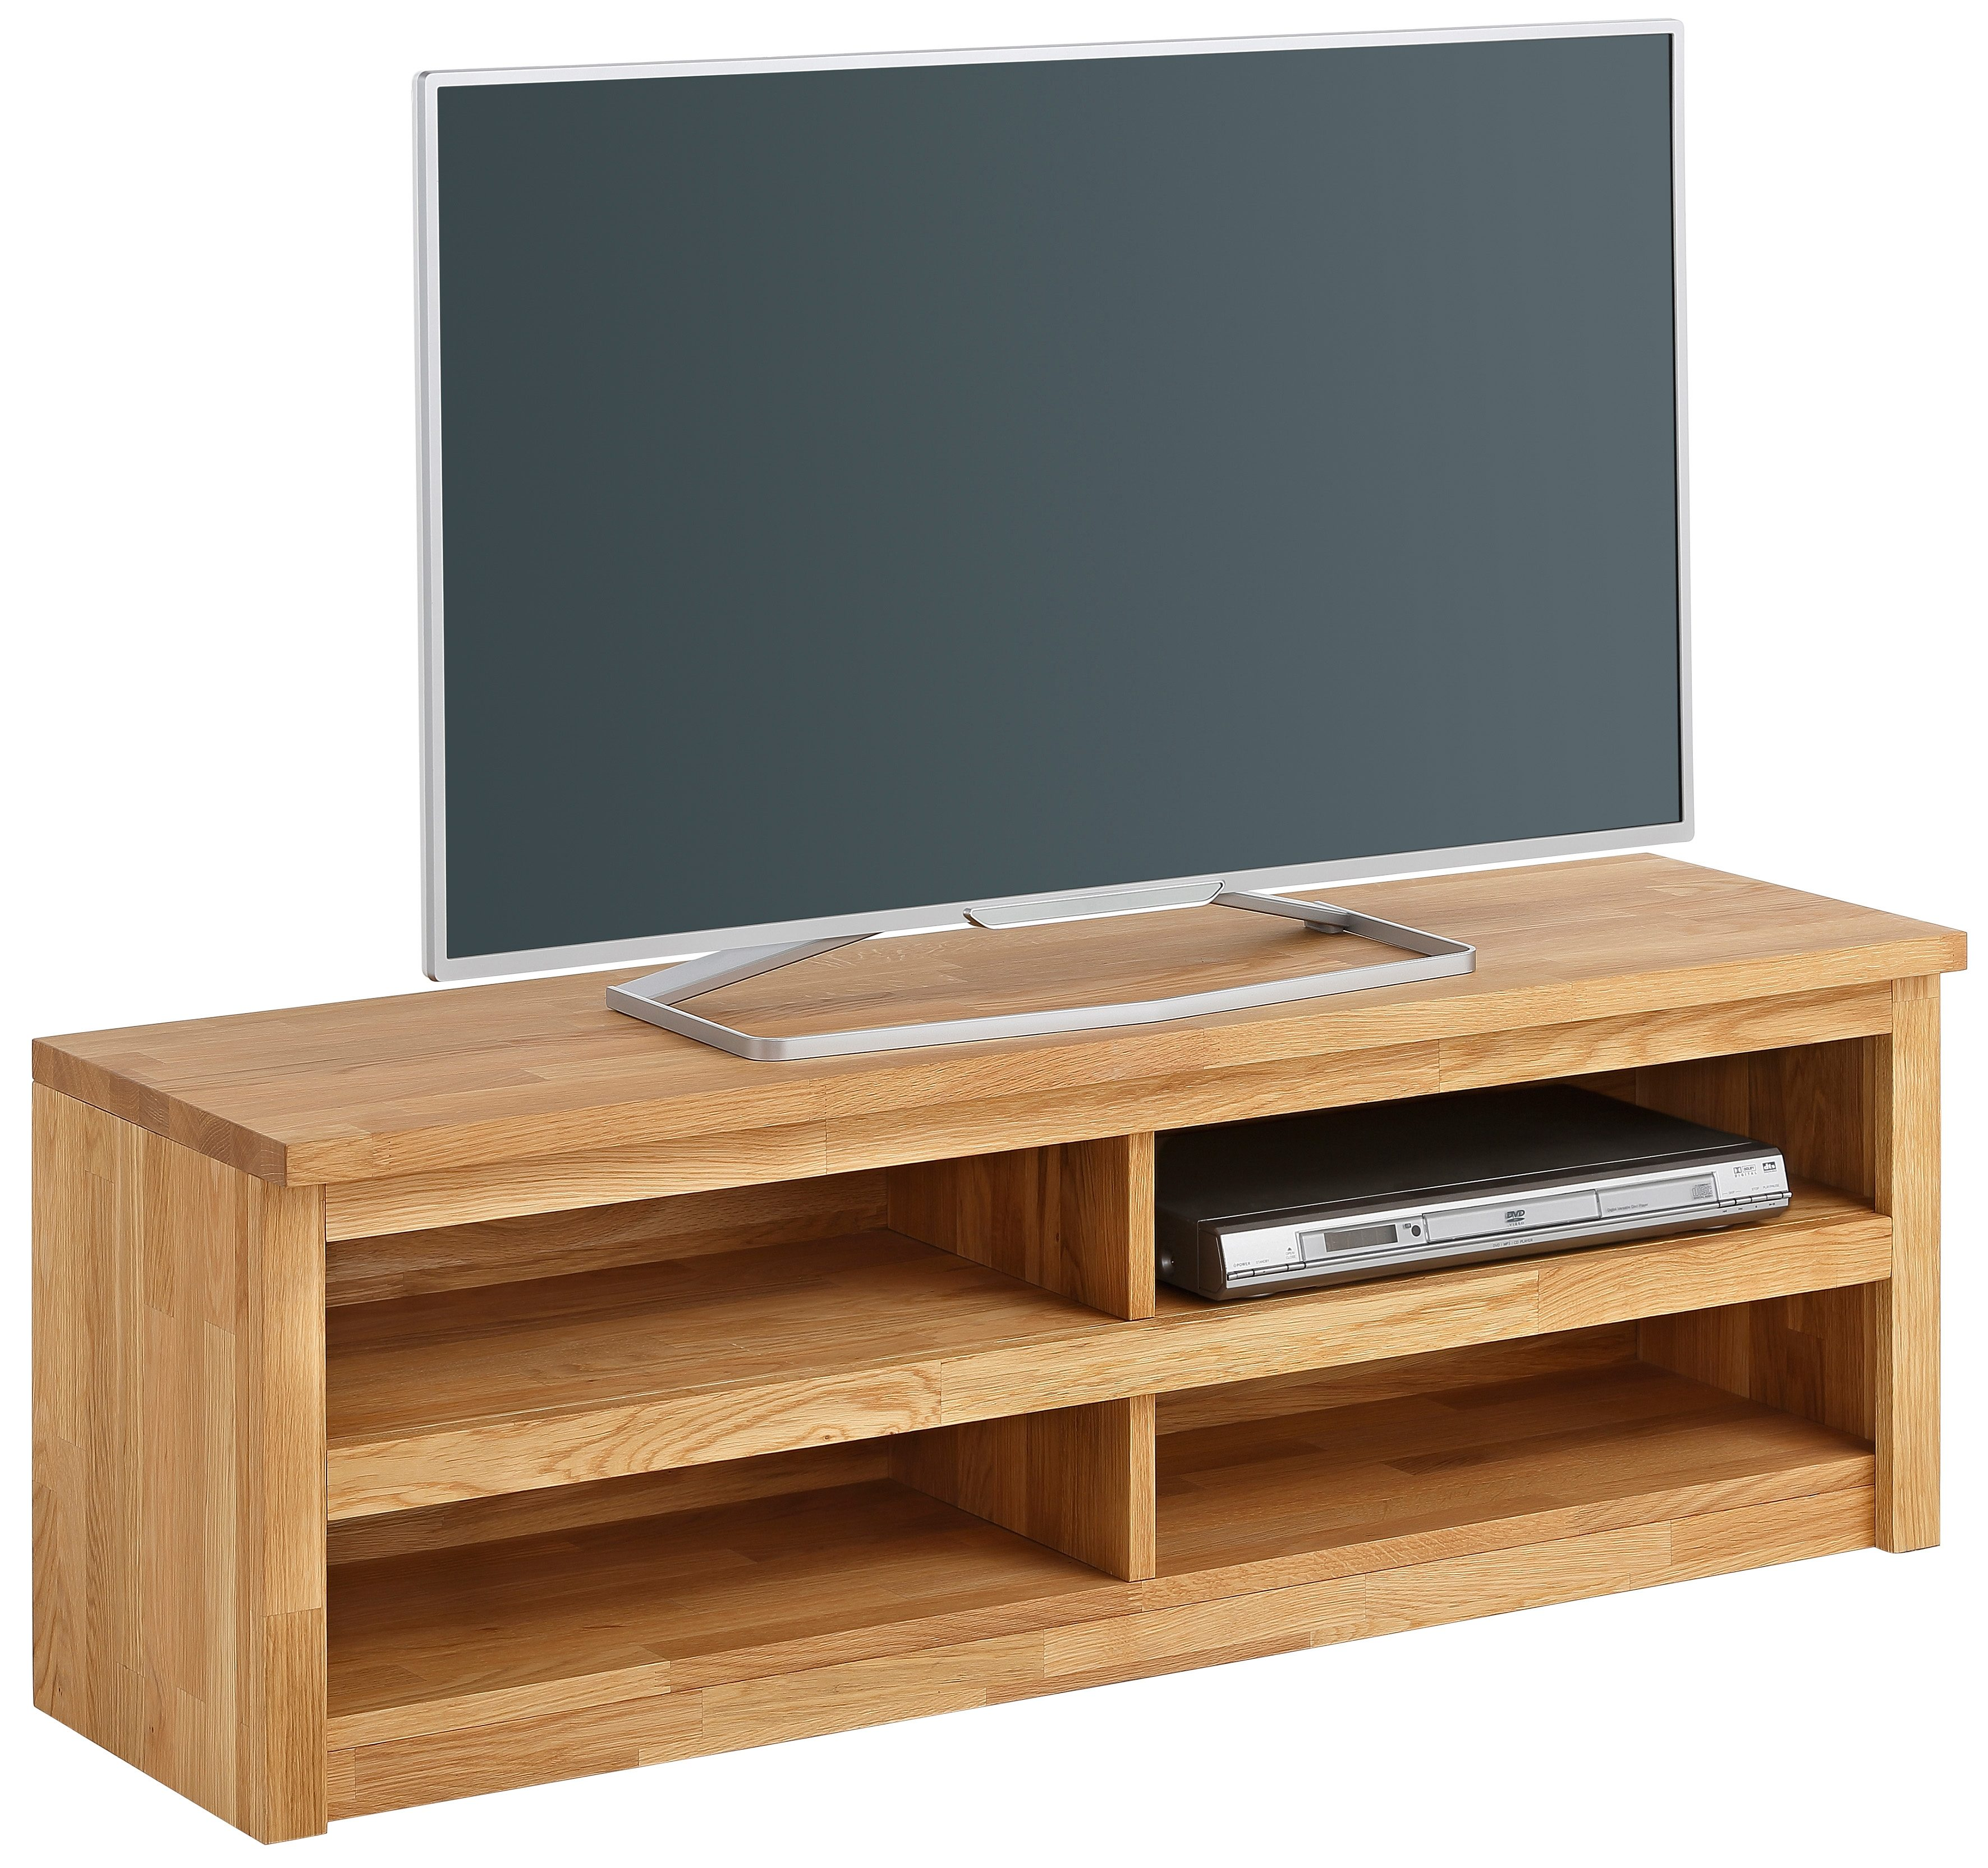 Home affaire Lowboard »Una«, Breite 120 cm, vollmassive aus Eiche